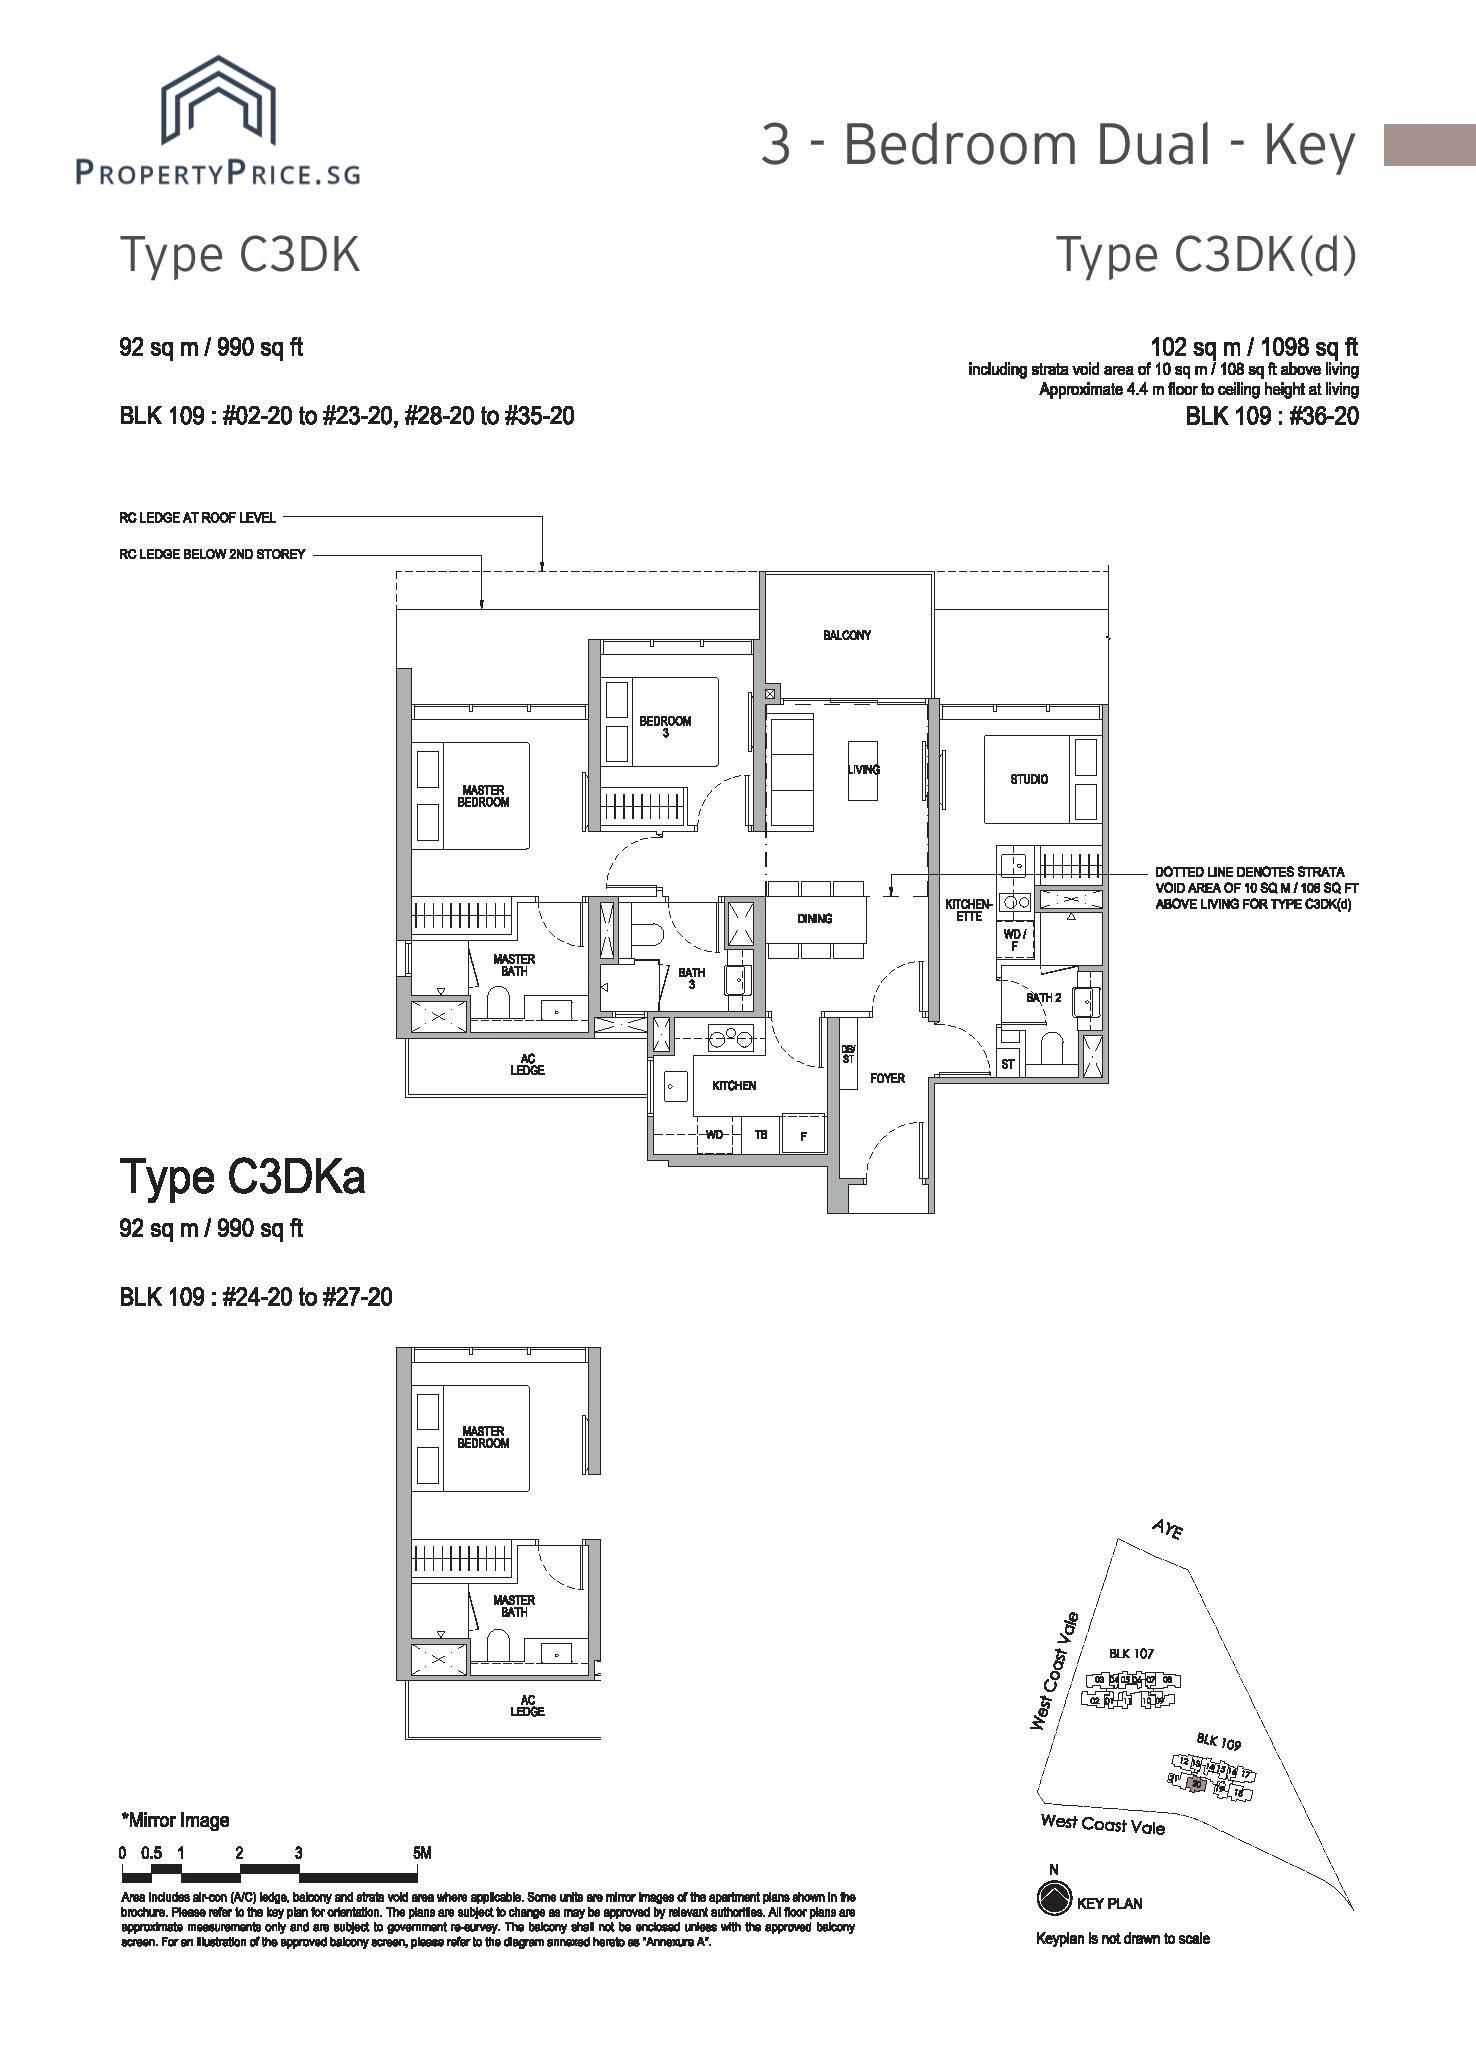 Type C3DK(d)